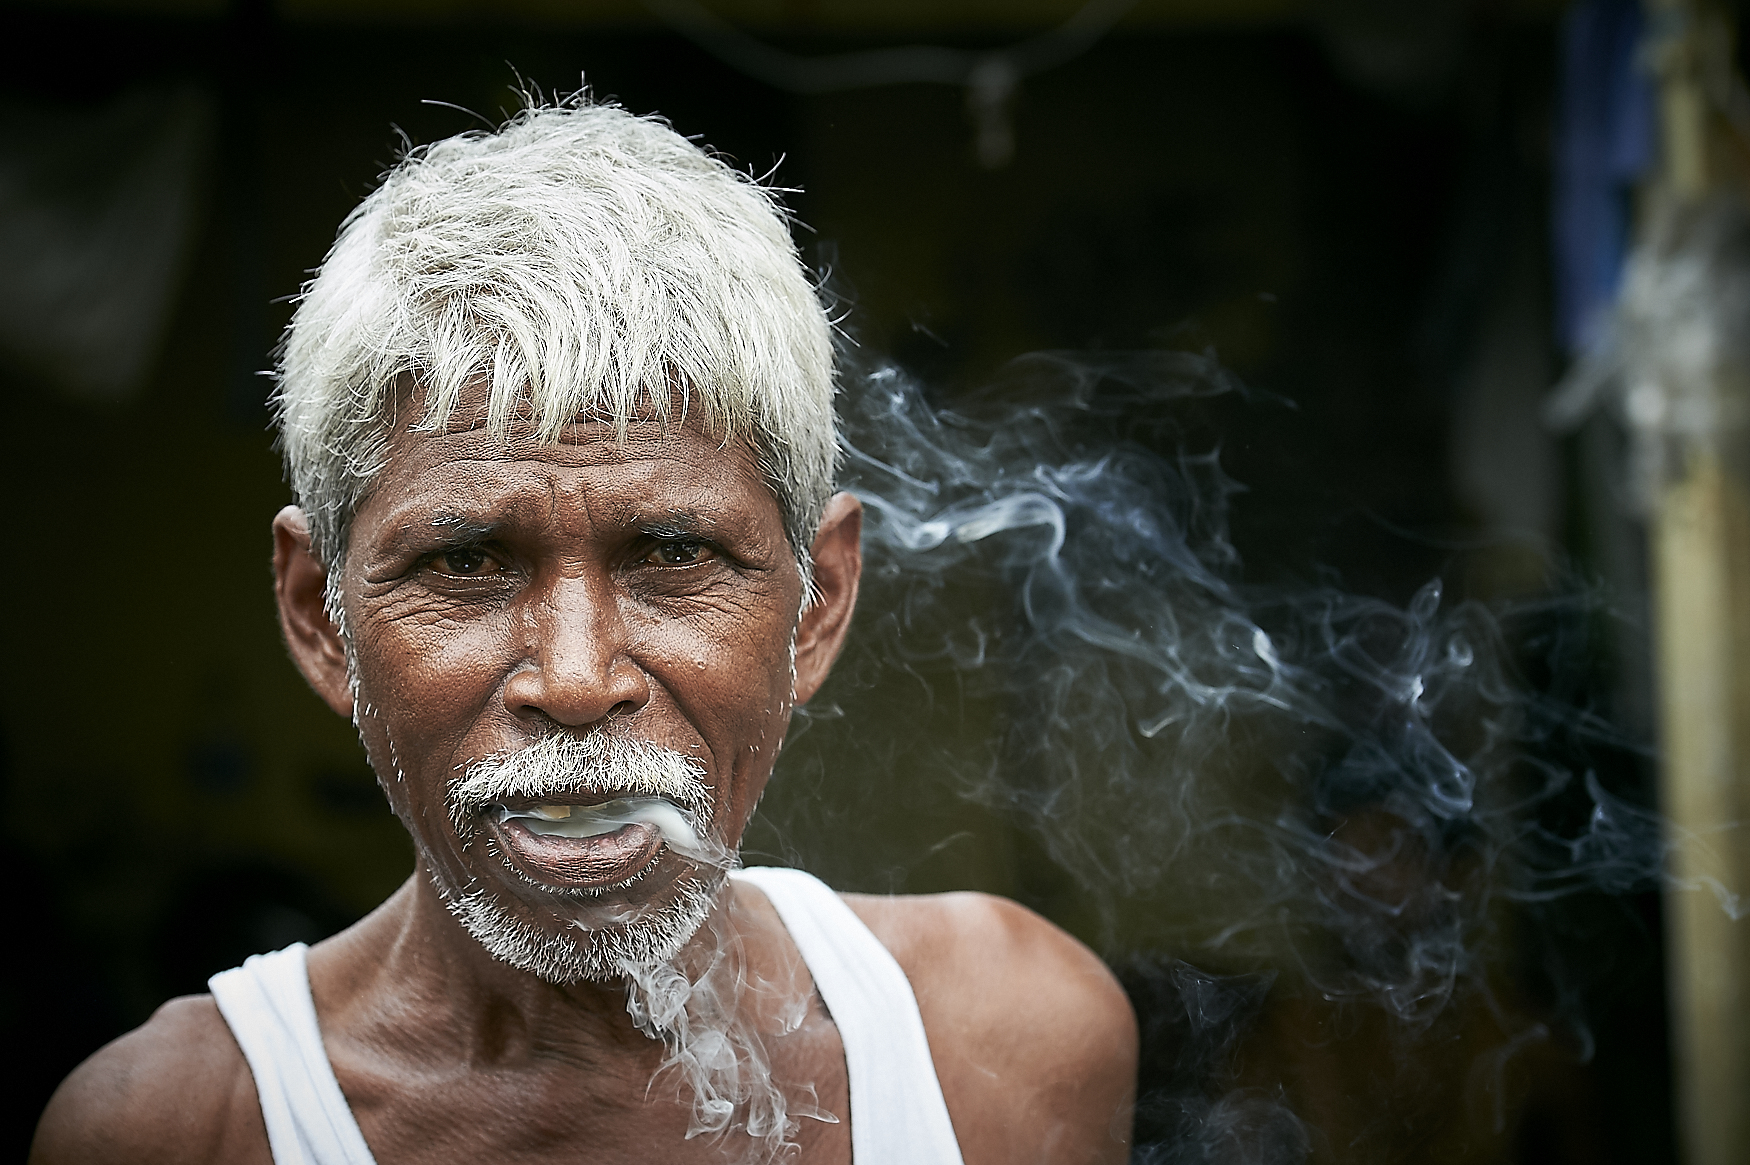 Dhobi Ghat washer, Mumbai